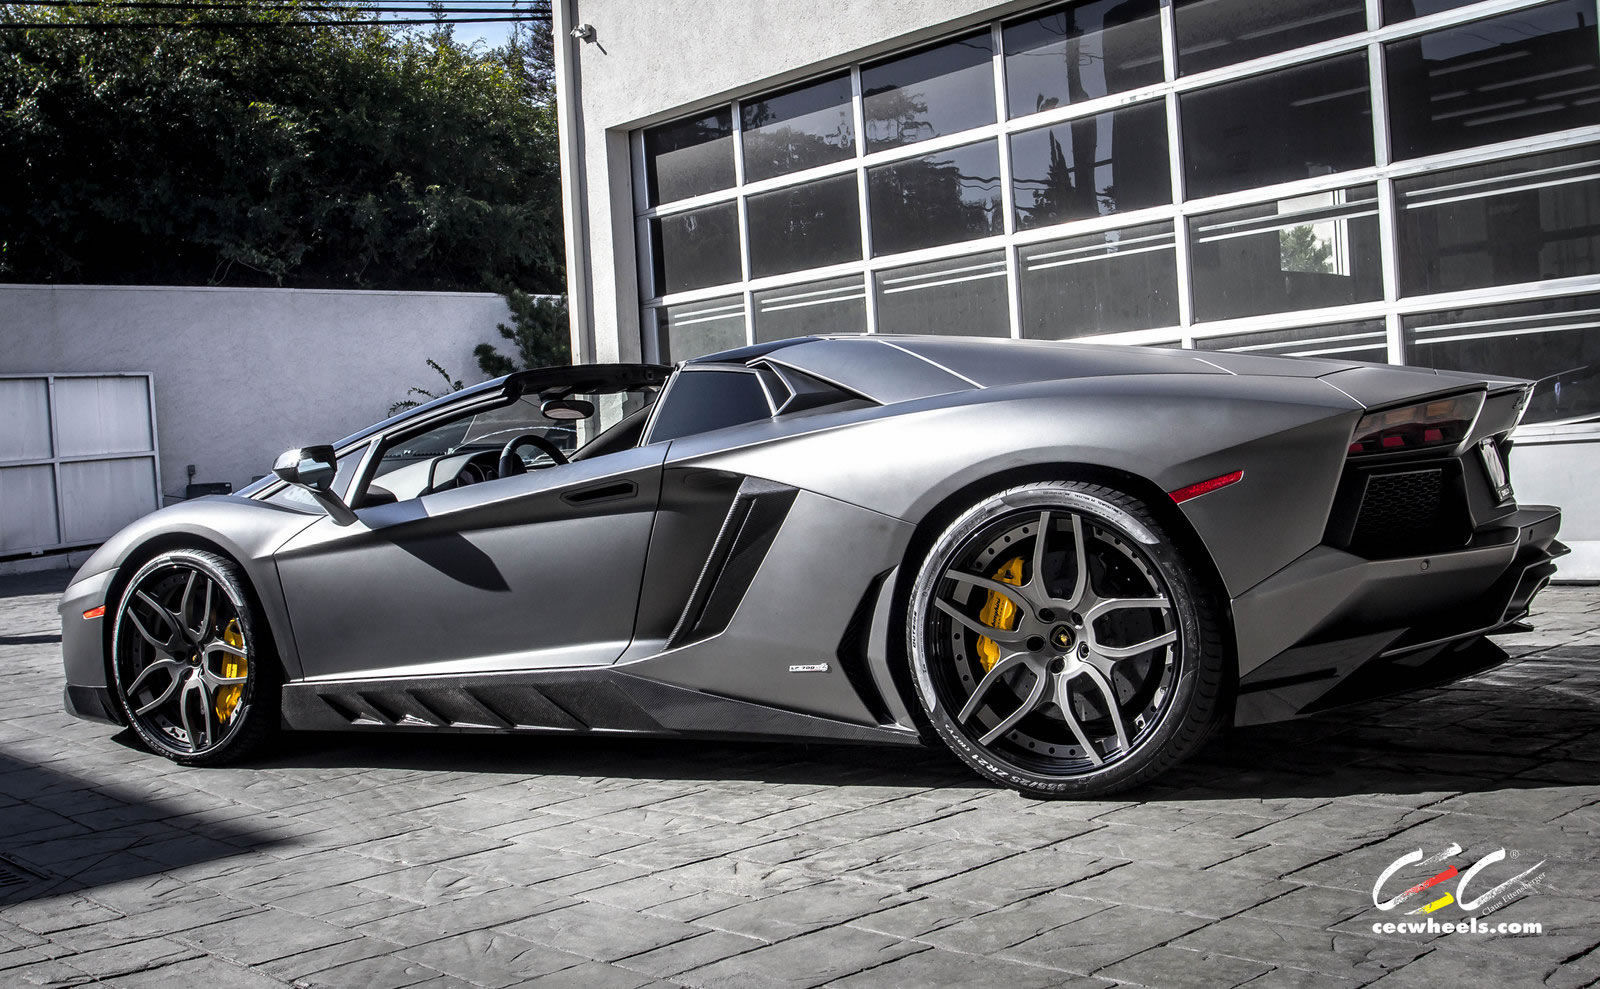 Lamborghini Aventador | The Aventador Roadster on CEC Wheels